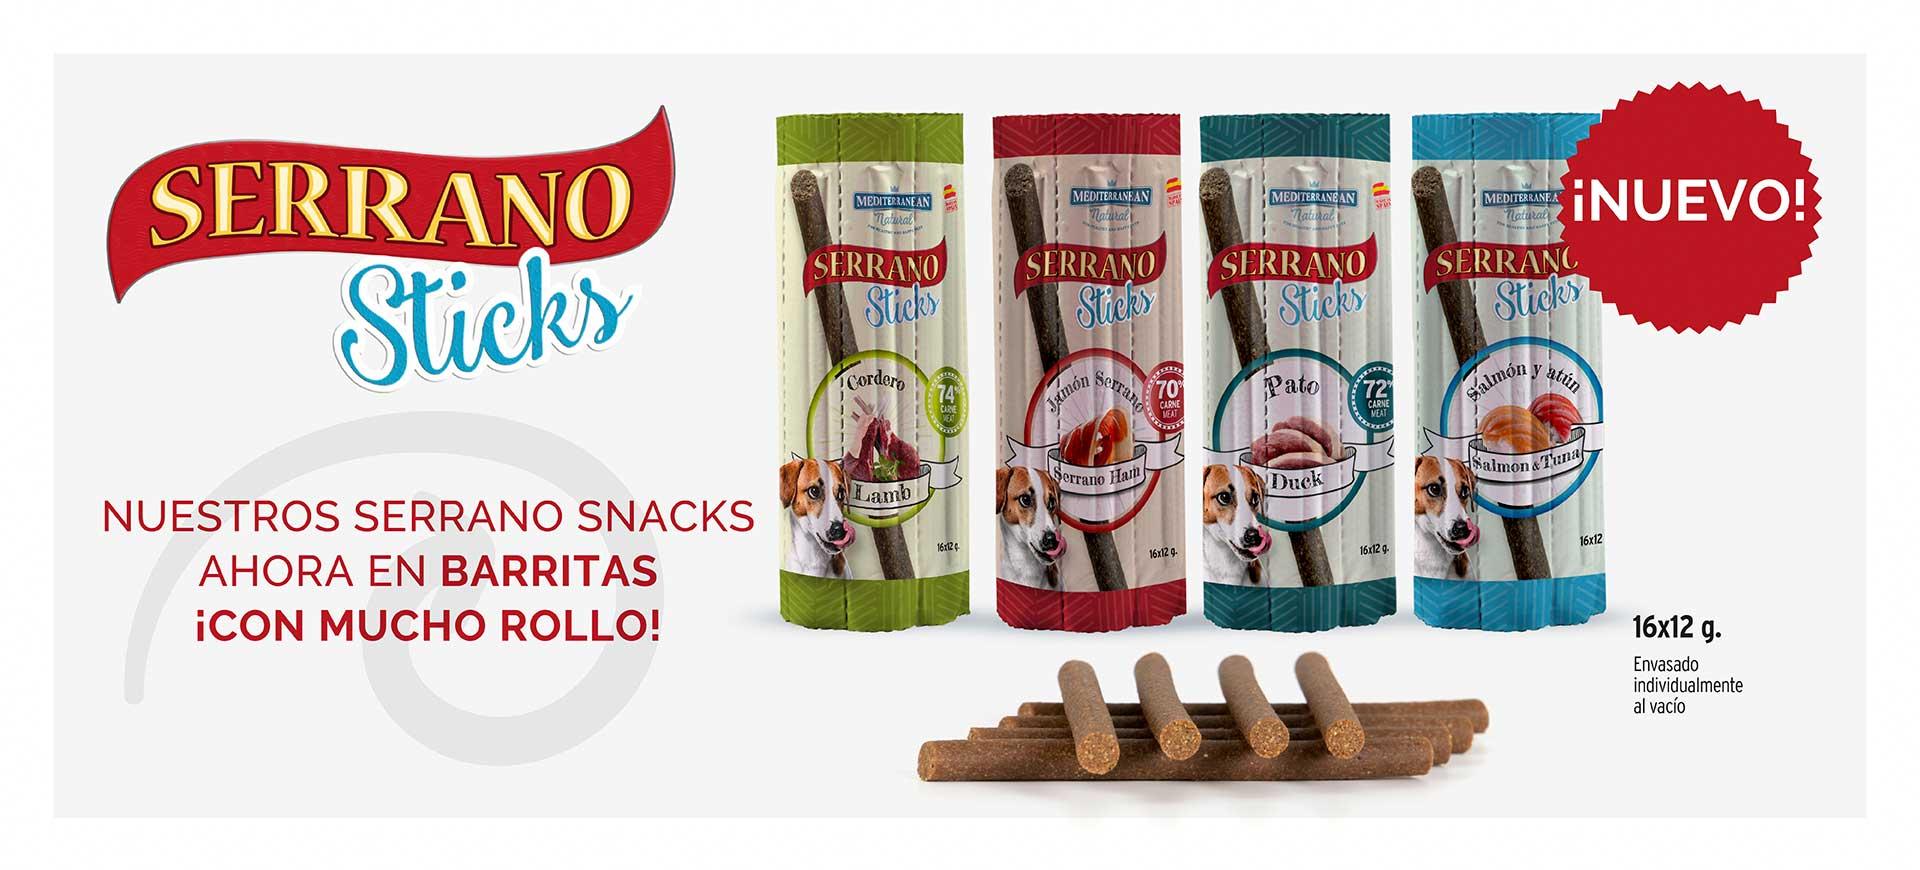 Serrano Sticks de Mediterranean Natural para perros sabores